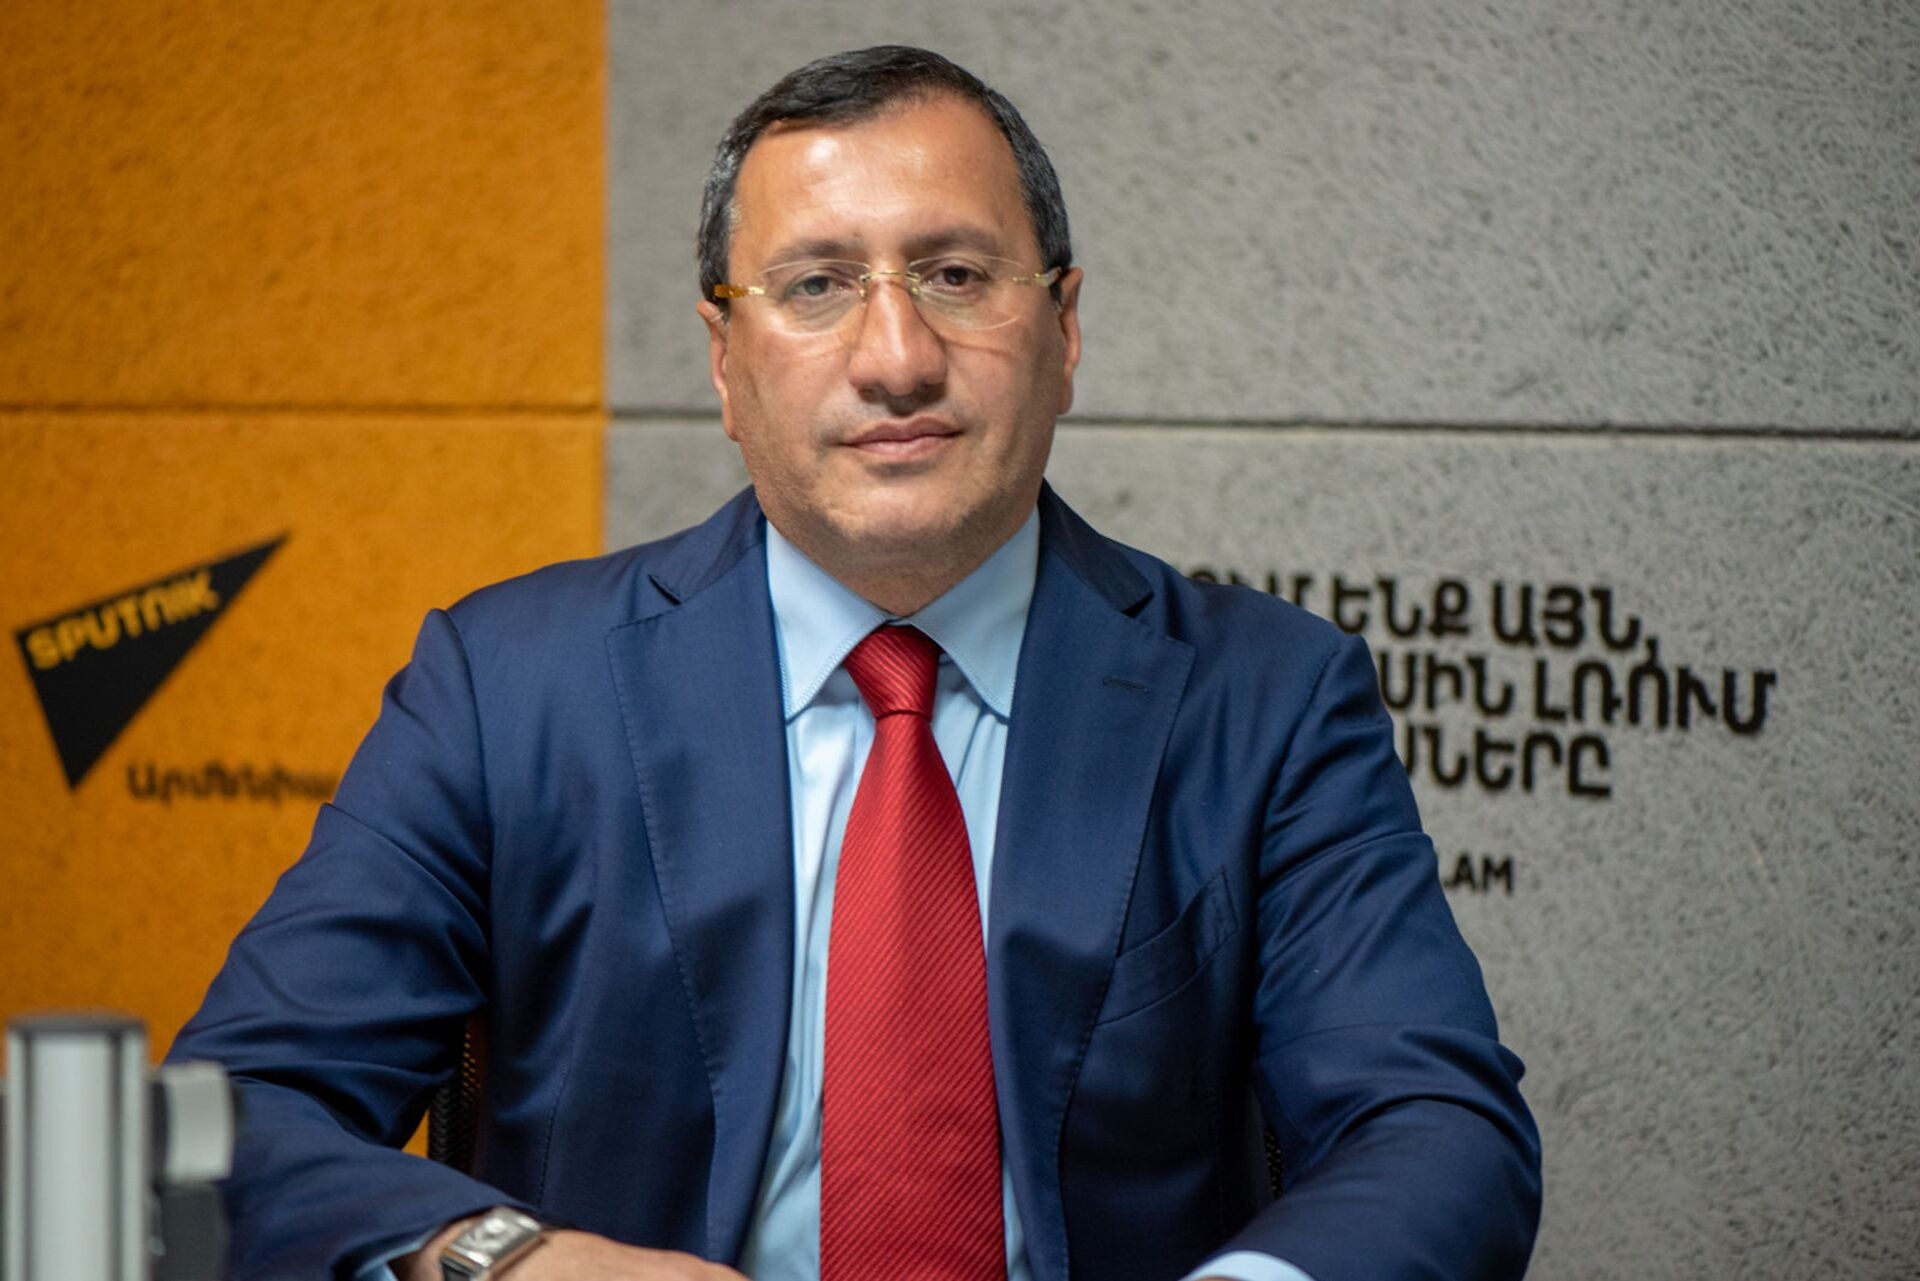 Людям не нужен ни Пашинян, ни Кочарян: Тигран Арзаканцян надеется попасть в парламент - Sputnik Армения, 1920, 08.06.2021